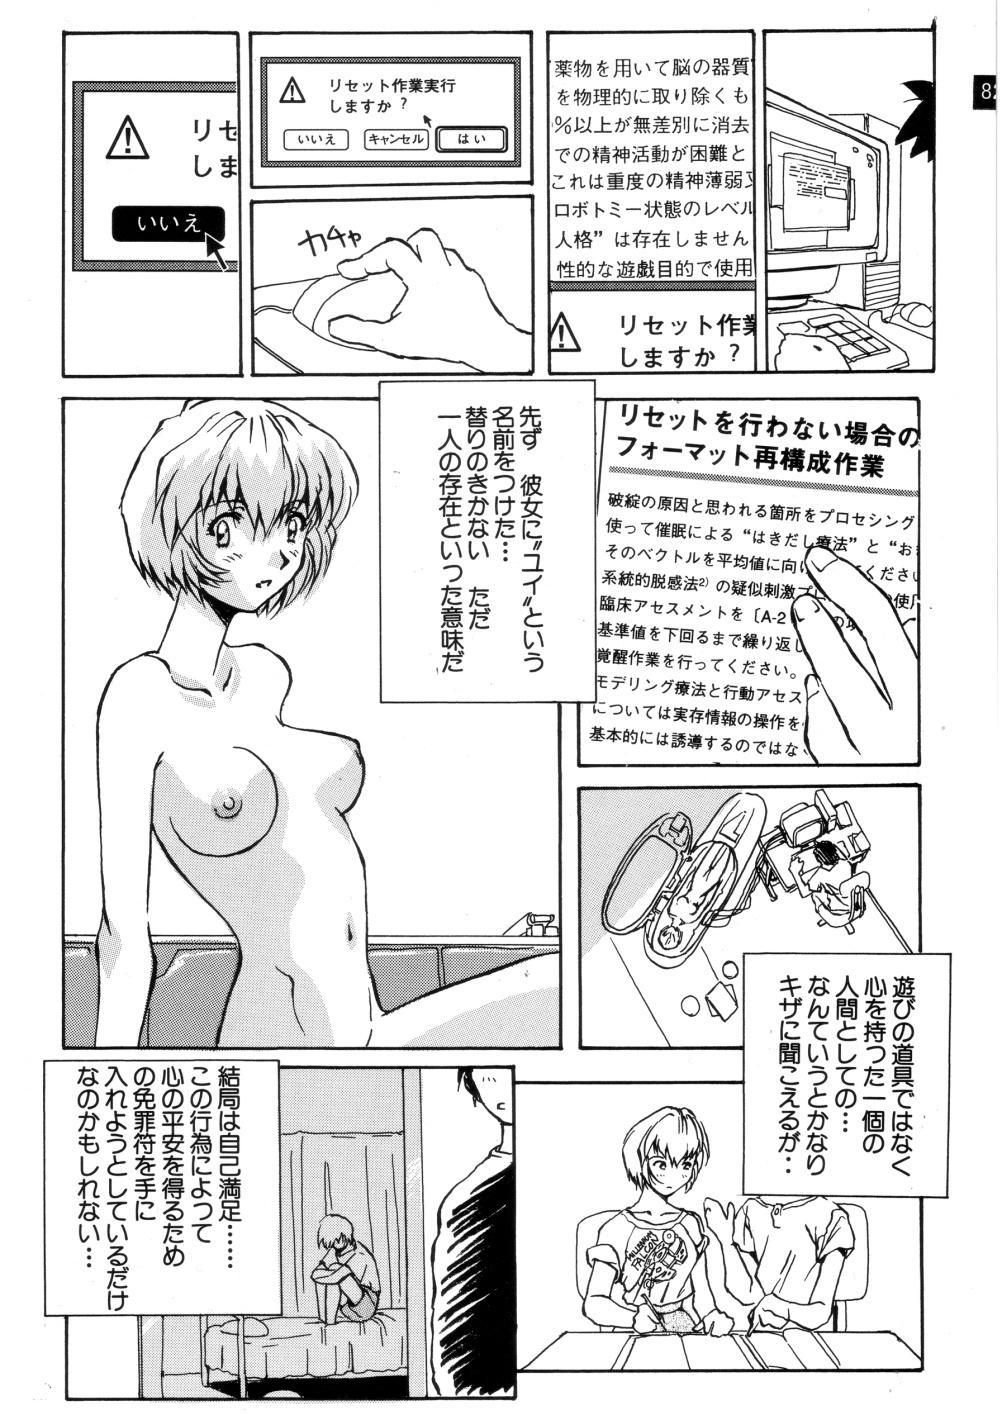 Zense Ki no Evangerikosan 82